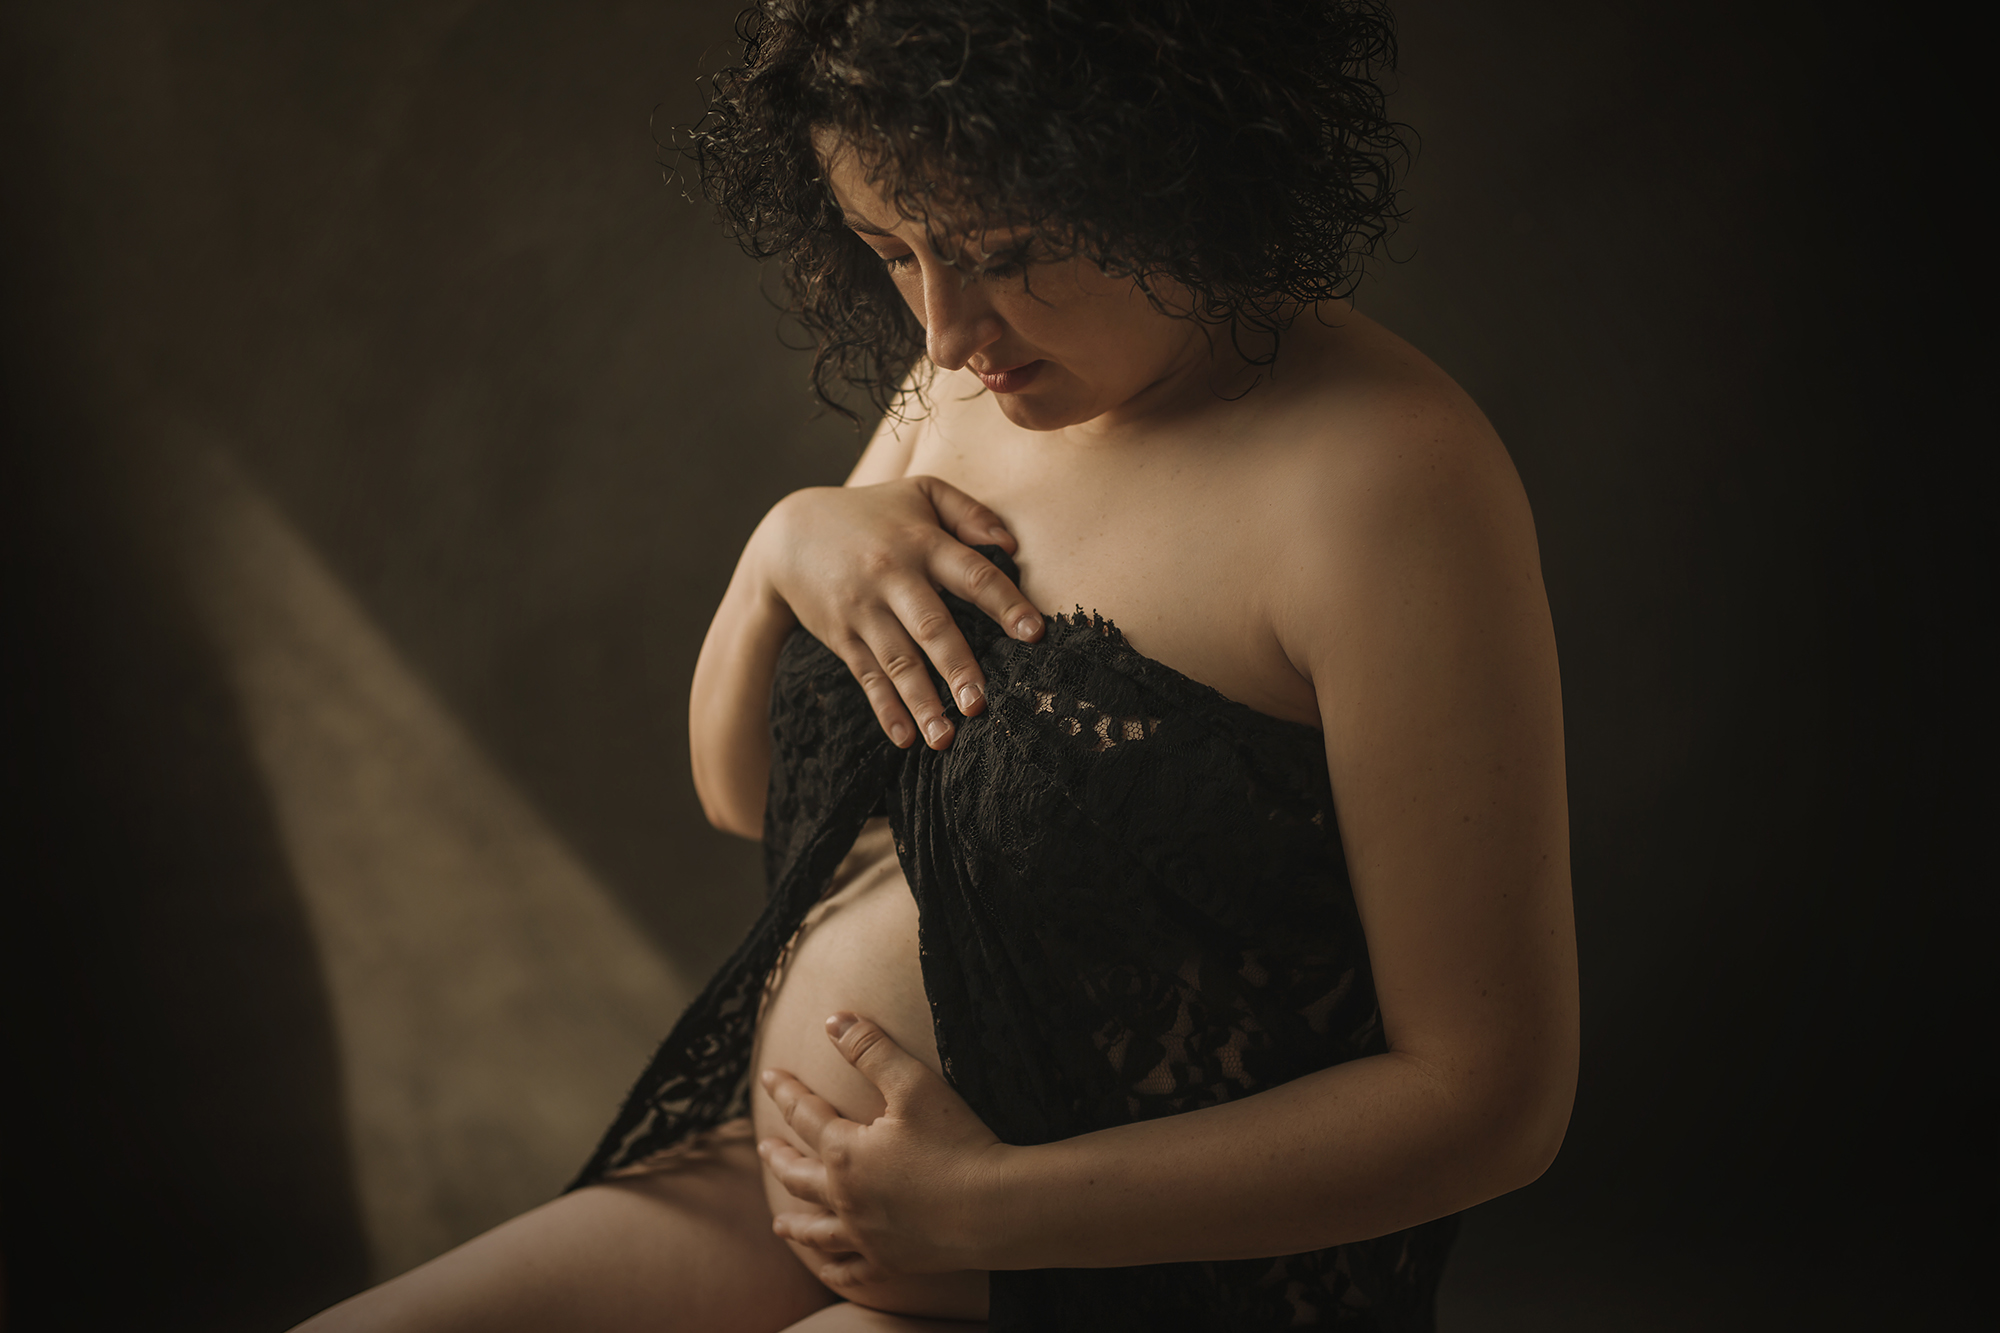 bebé de 4 meses, primer año bebé, bebé de 7 meses, bebé de 8 meses, seguimiento primer año, fotografia bebés en estudio